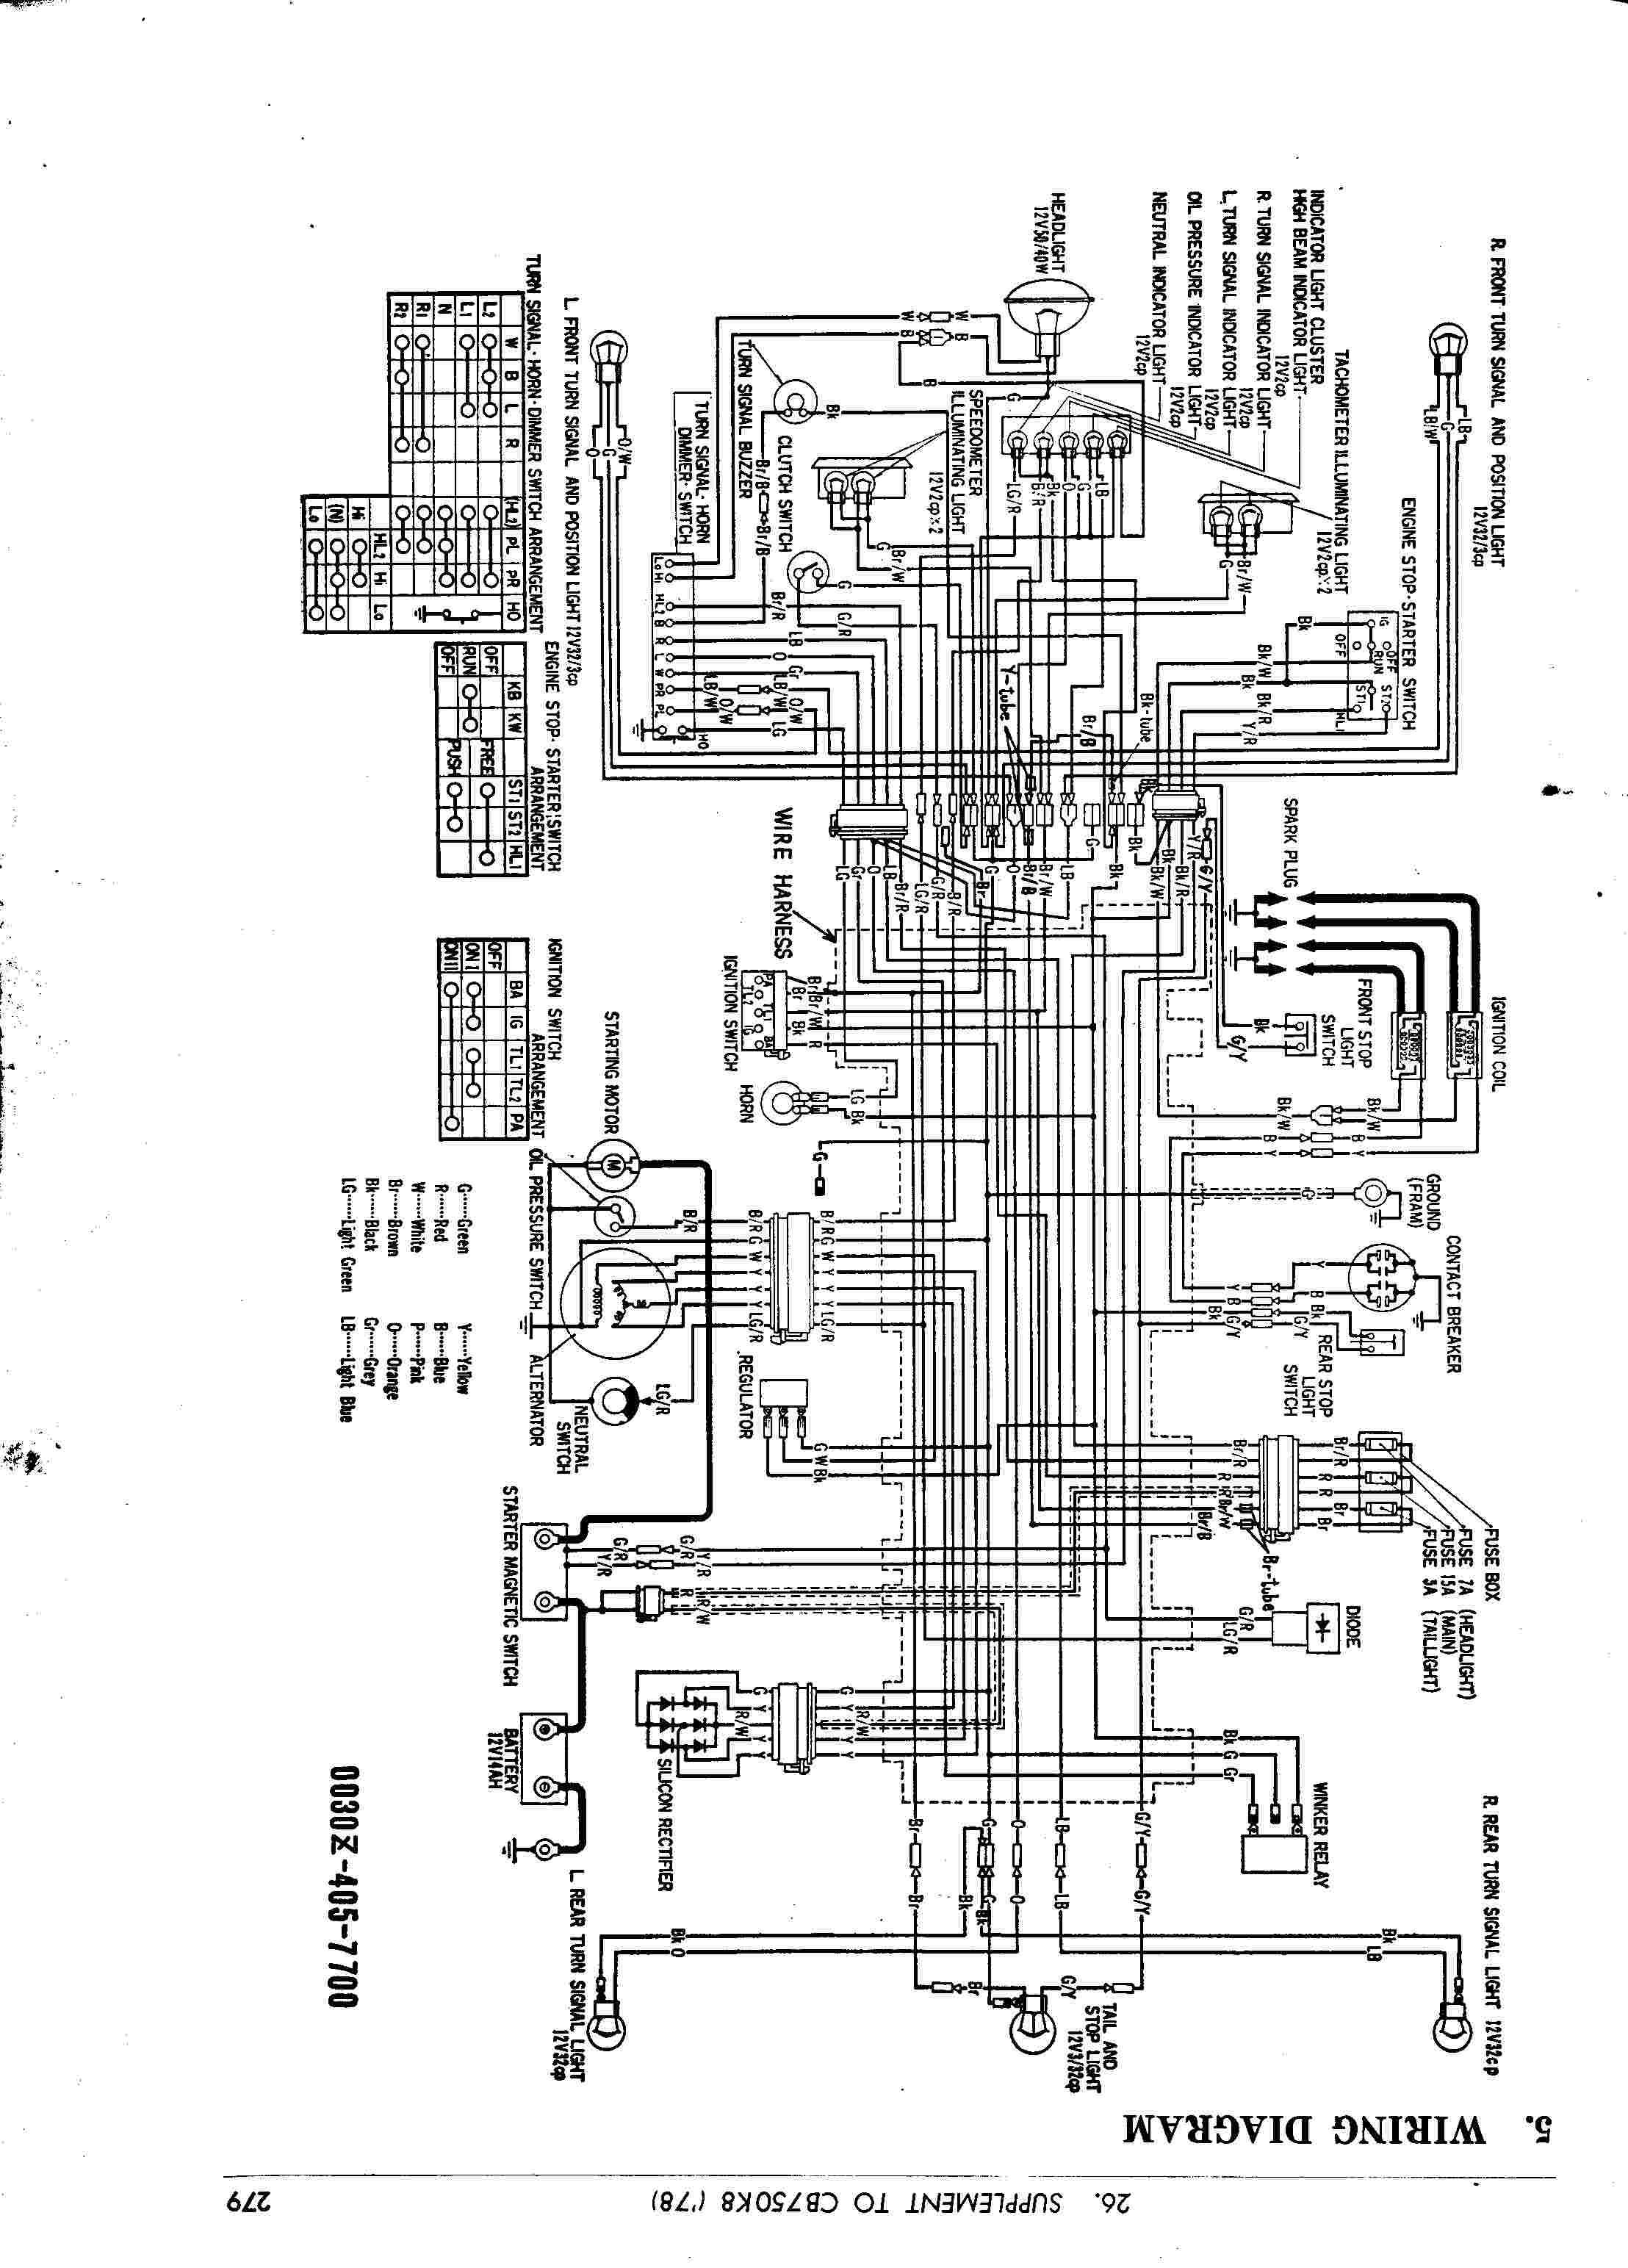 Yamaha Xs1100 Special Wiring Diagram